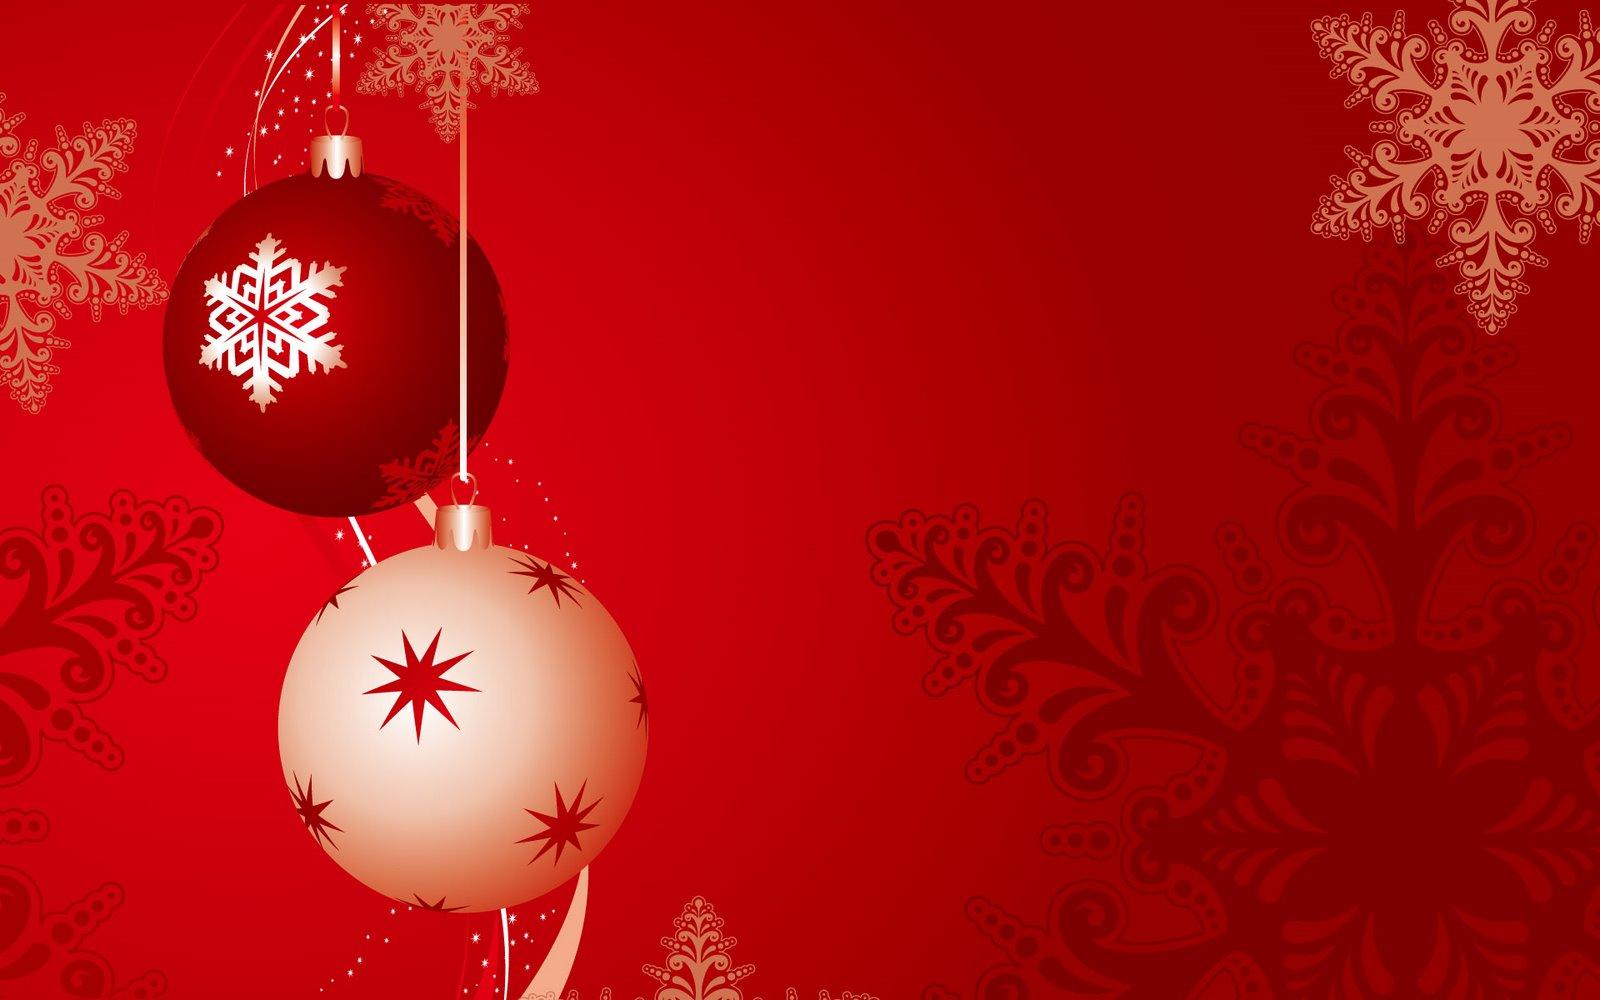 3d christmas wallpapers wallpaper wallpapers download 1600x1000